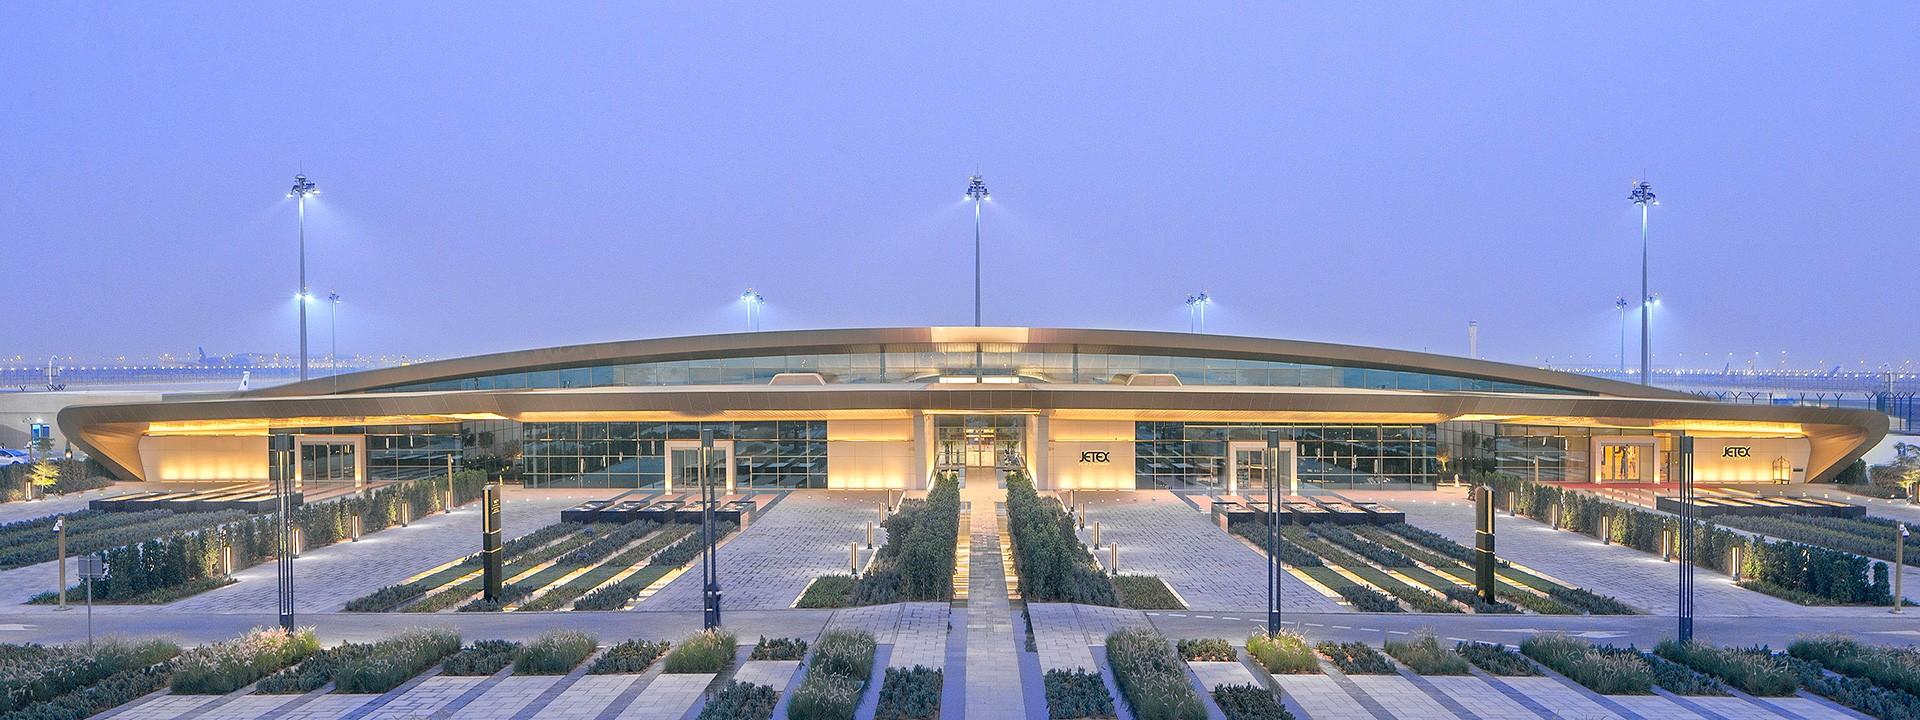 Dubai FBO Terminal